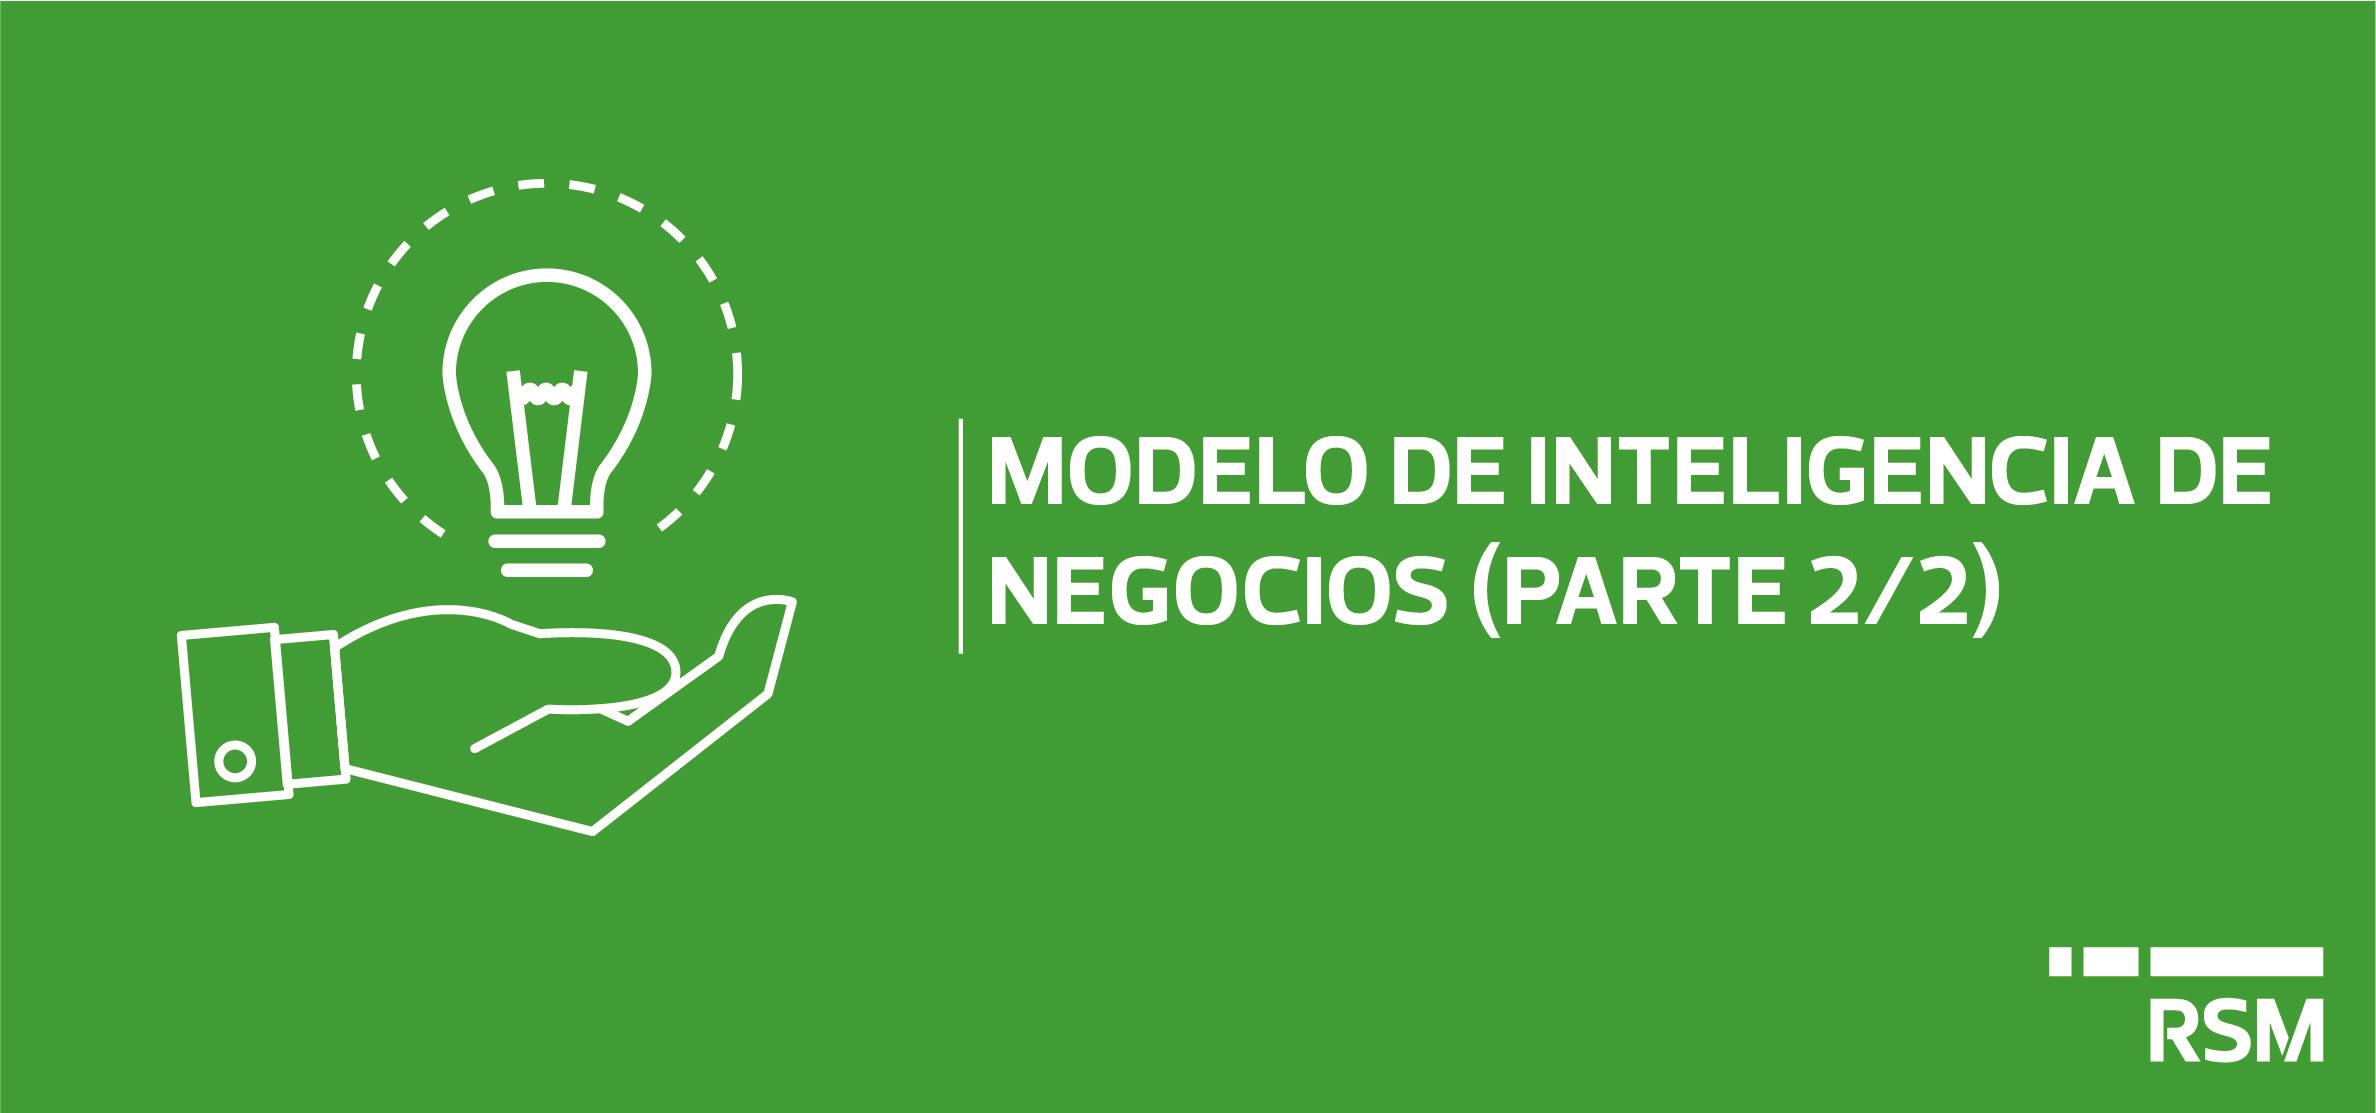 public://media/Lineas_negocio/consultoria/Insights/IMG/miniaturas_pagina_web_blogs-14.jpg